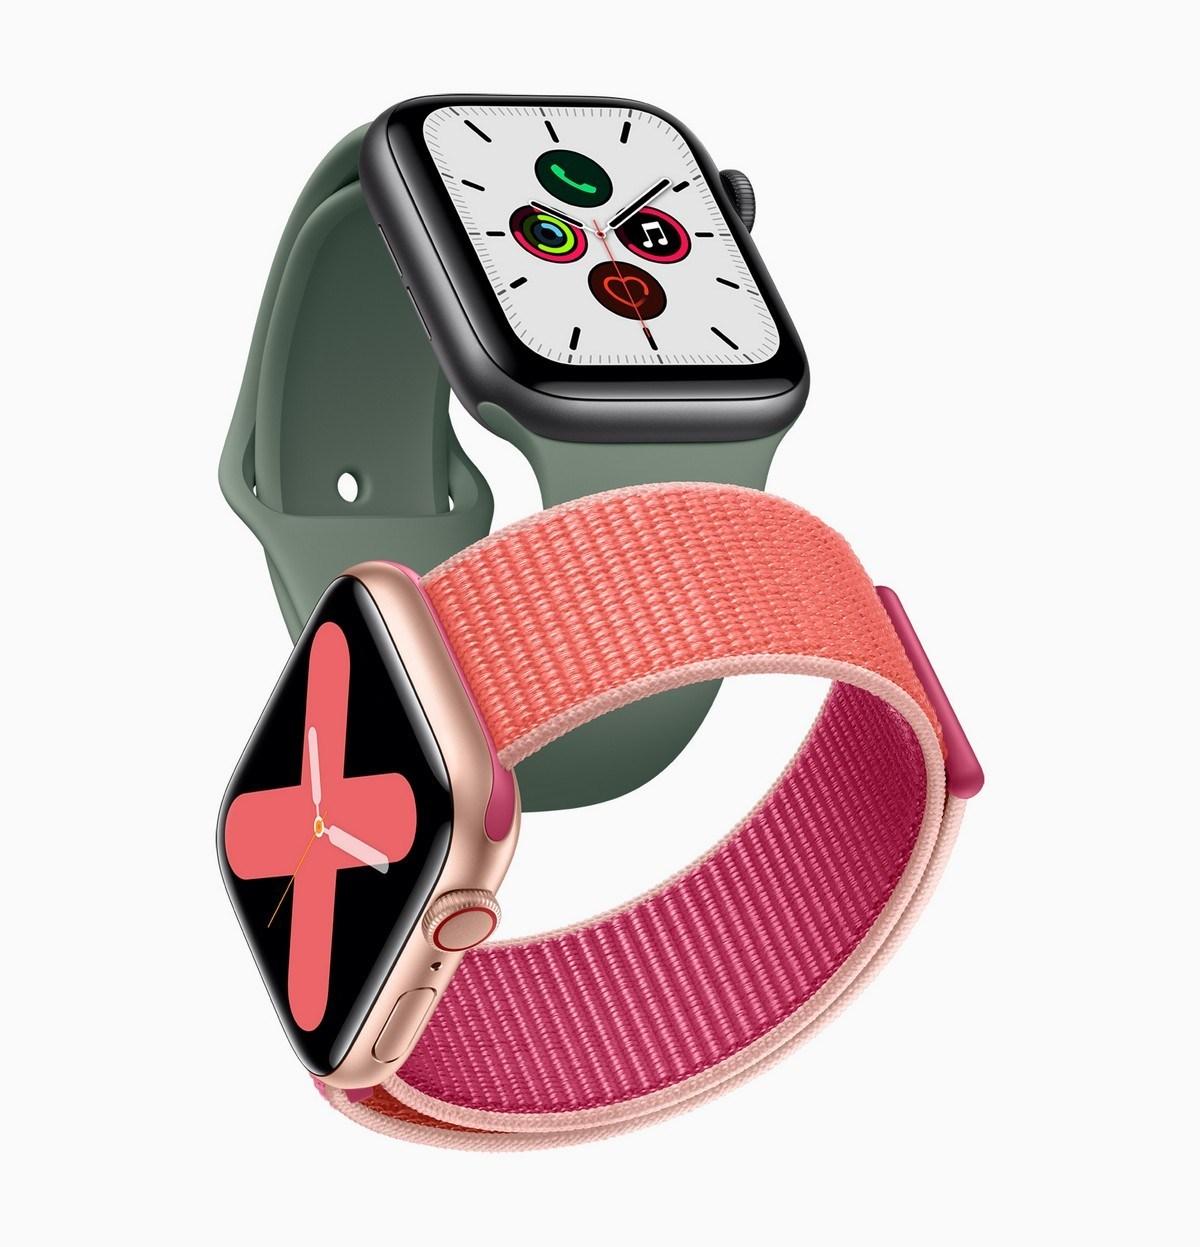 Apple Watchに指紋認証センサーを付ける特許、アップルが申請